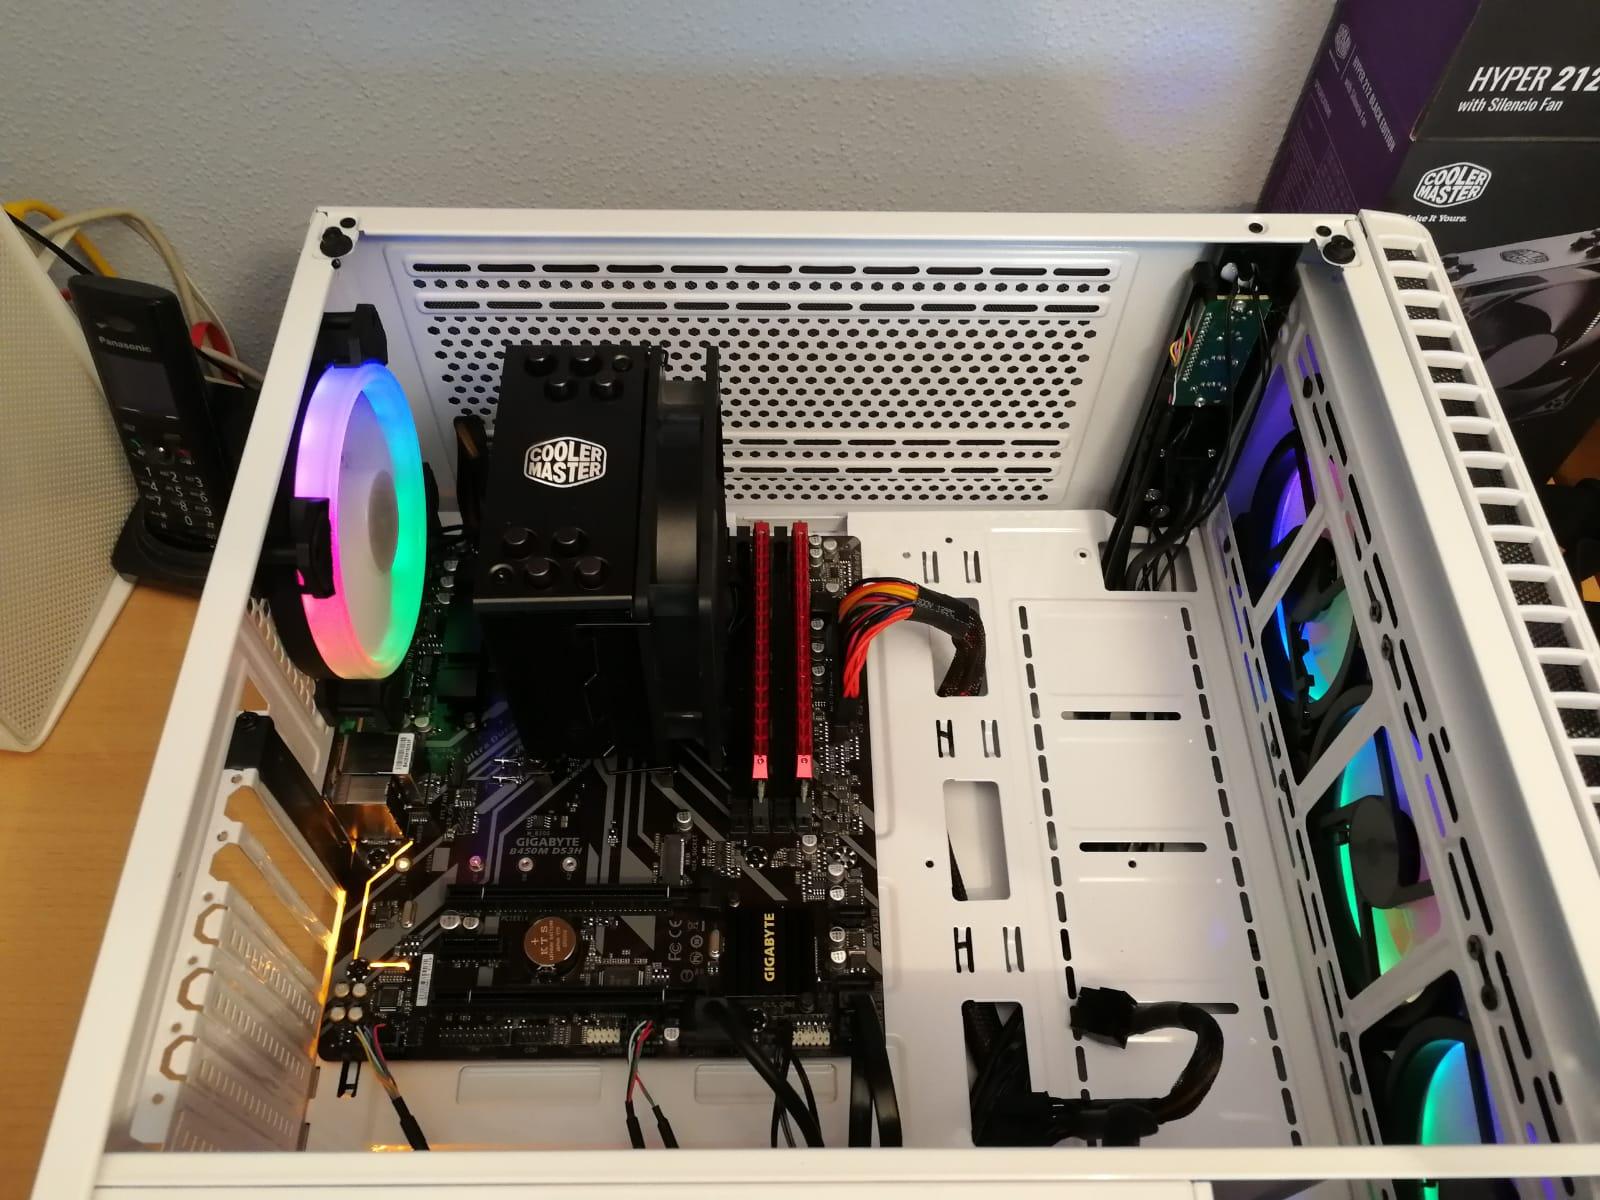 58379392 603055160215fgj2d - Testers Keepers: Cooler Master Hyper 212 Black Edition